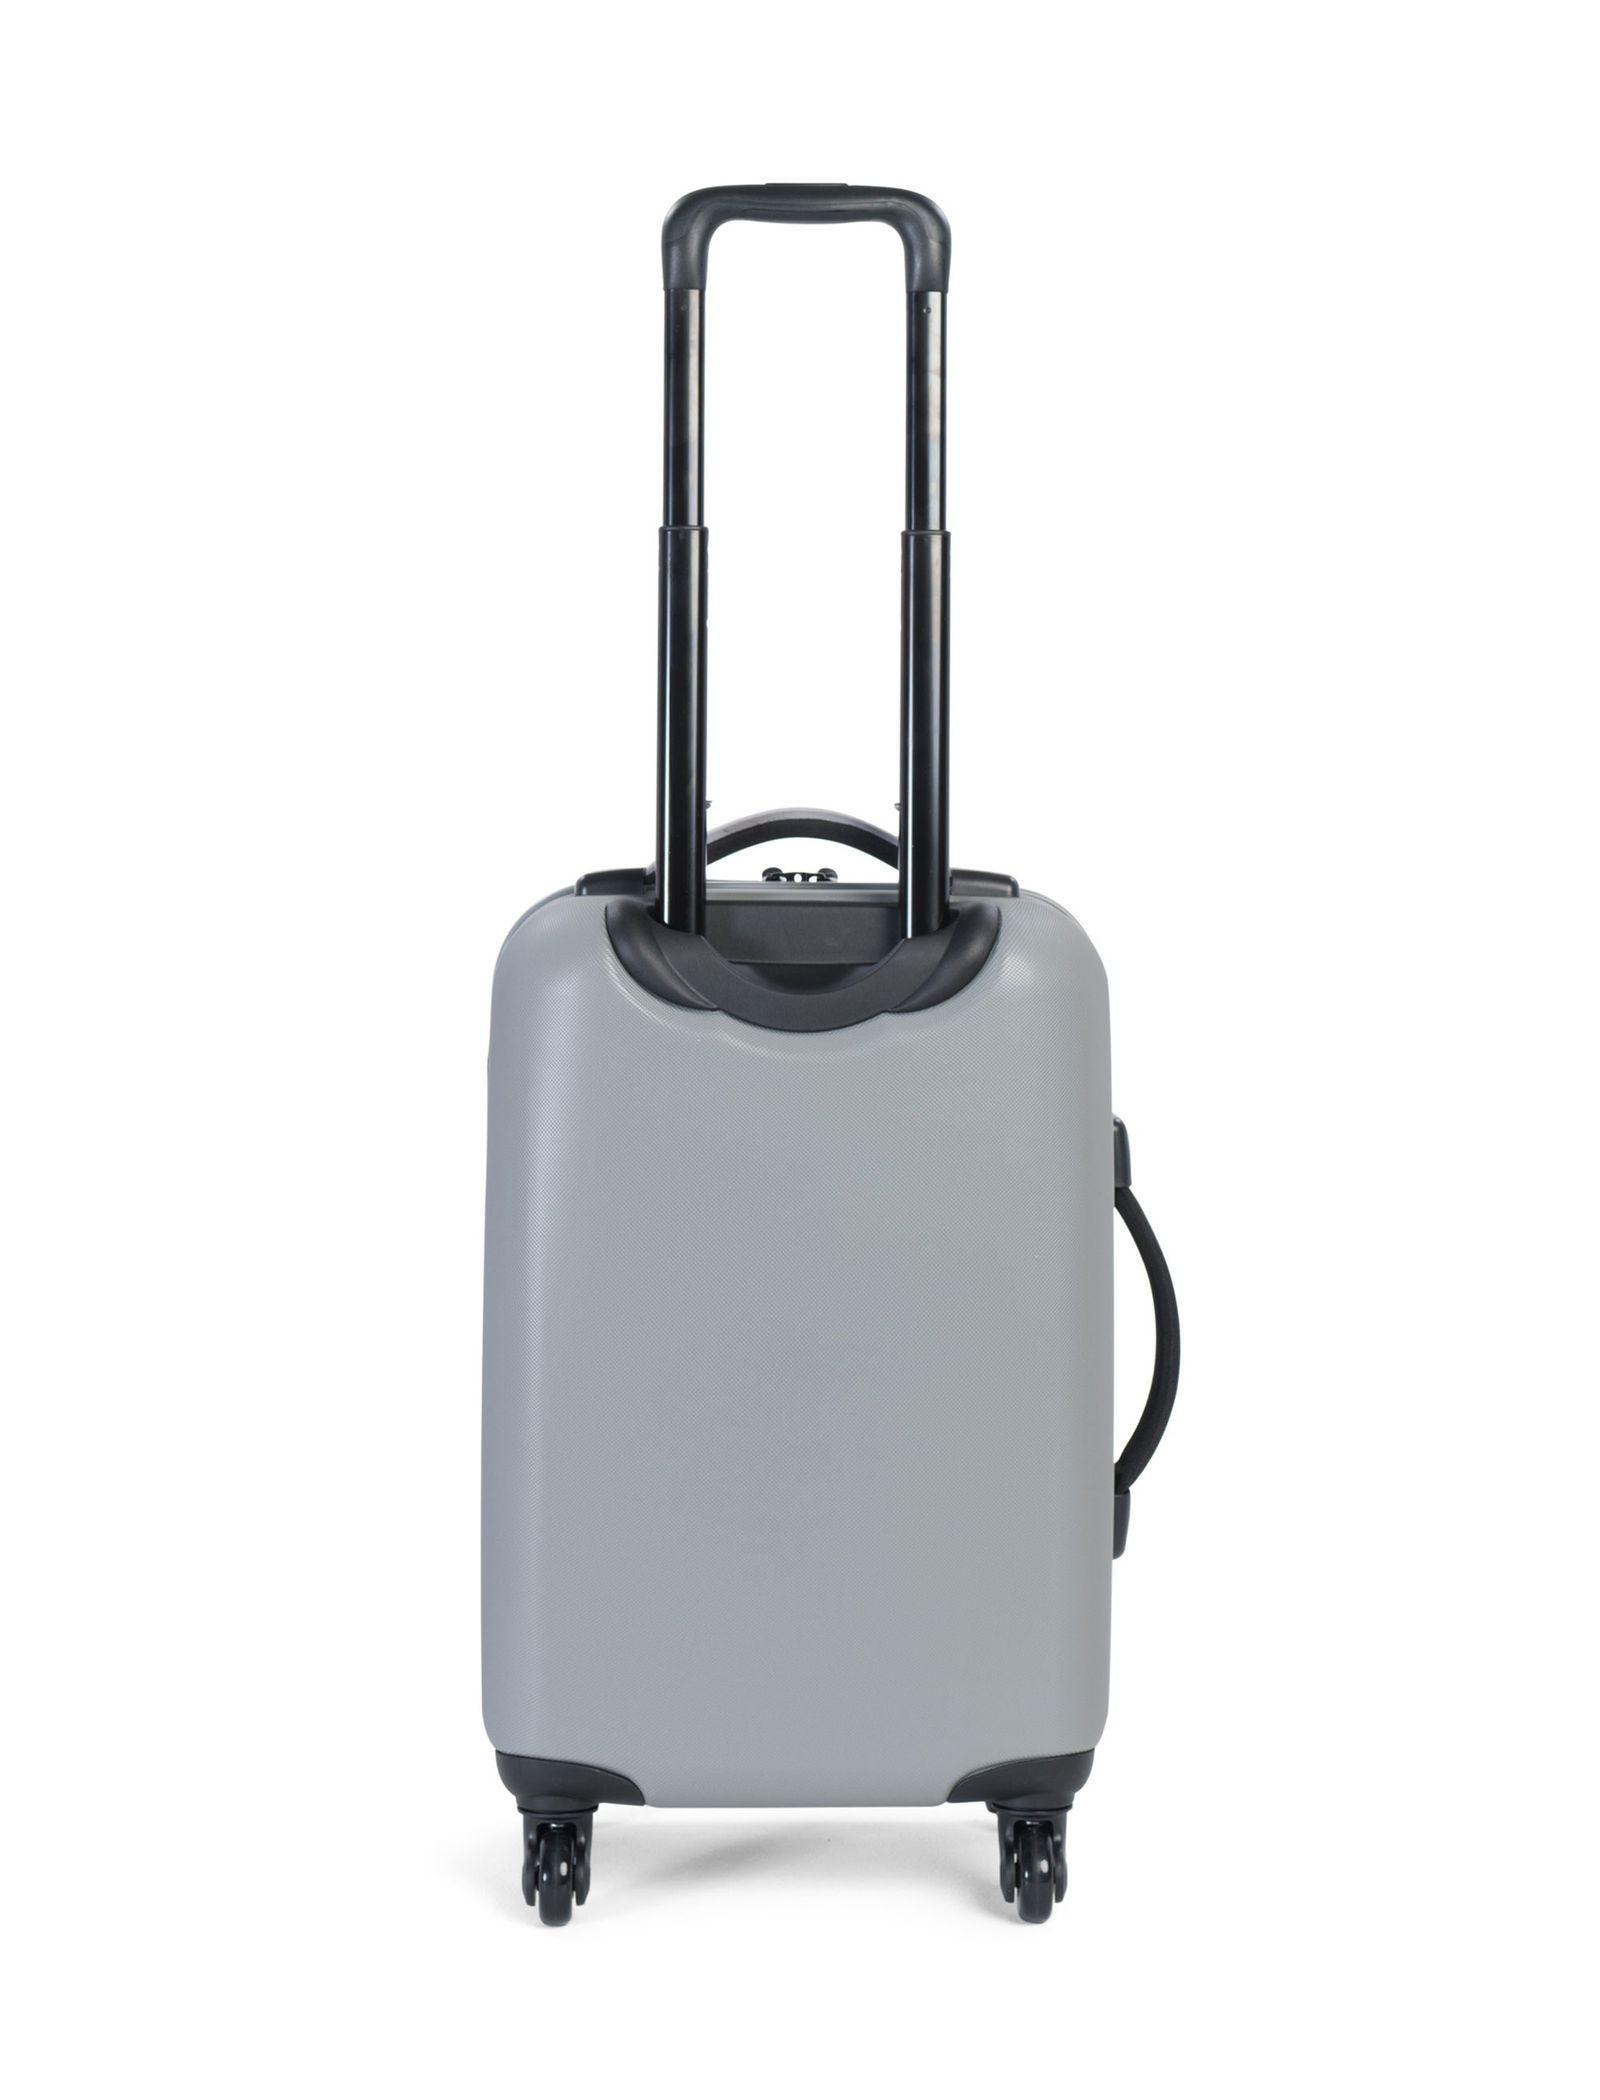 چمدان Trade Small - هرشل - طوسي - 4